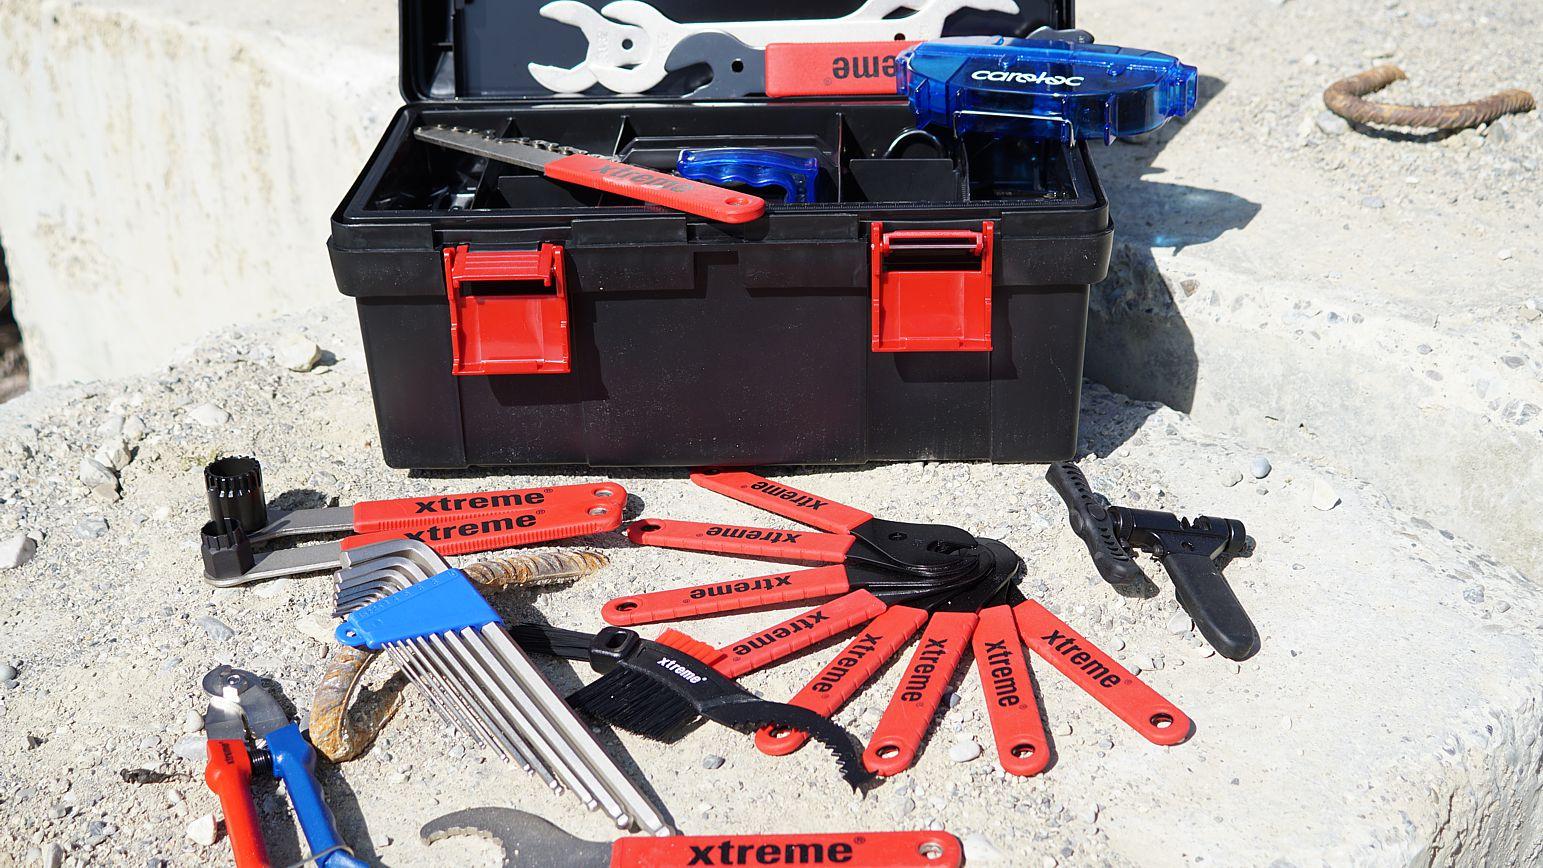 Rose Xtreme All-in-one XXL Werkzeug Set